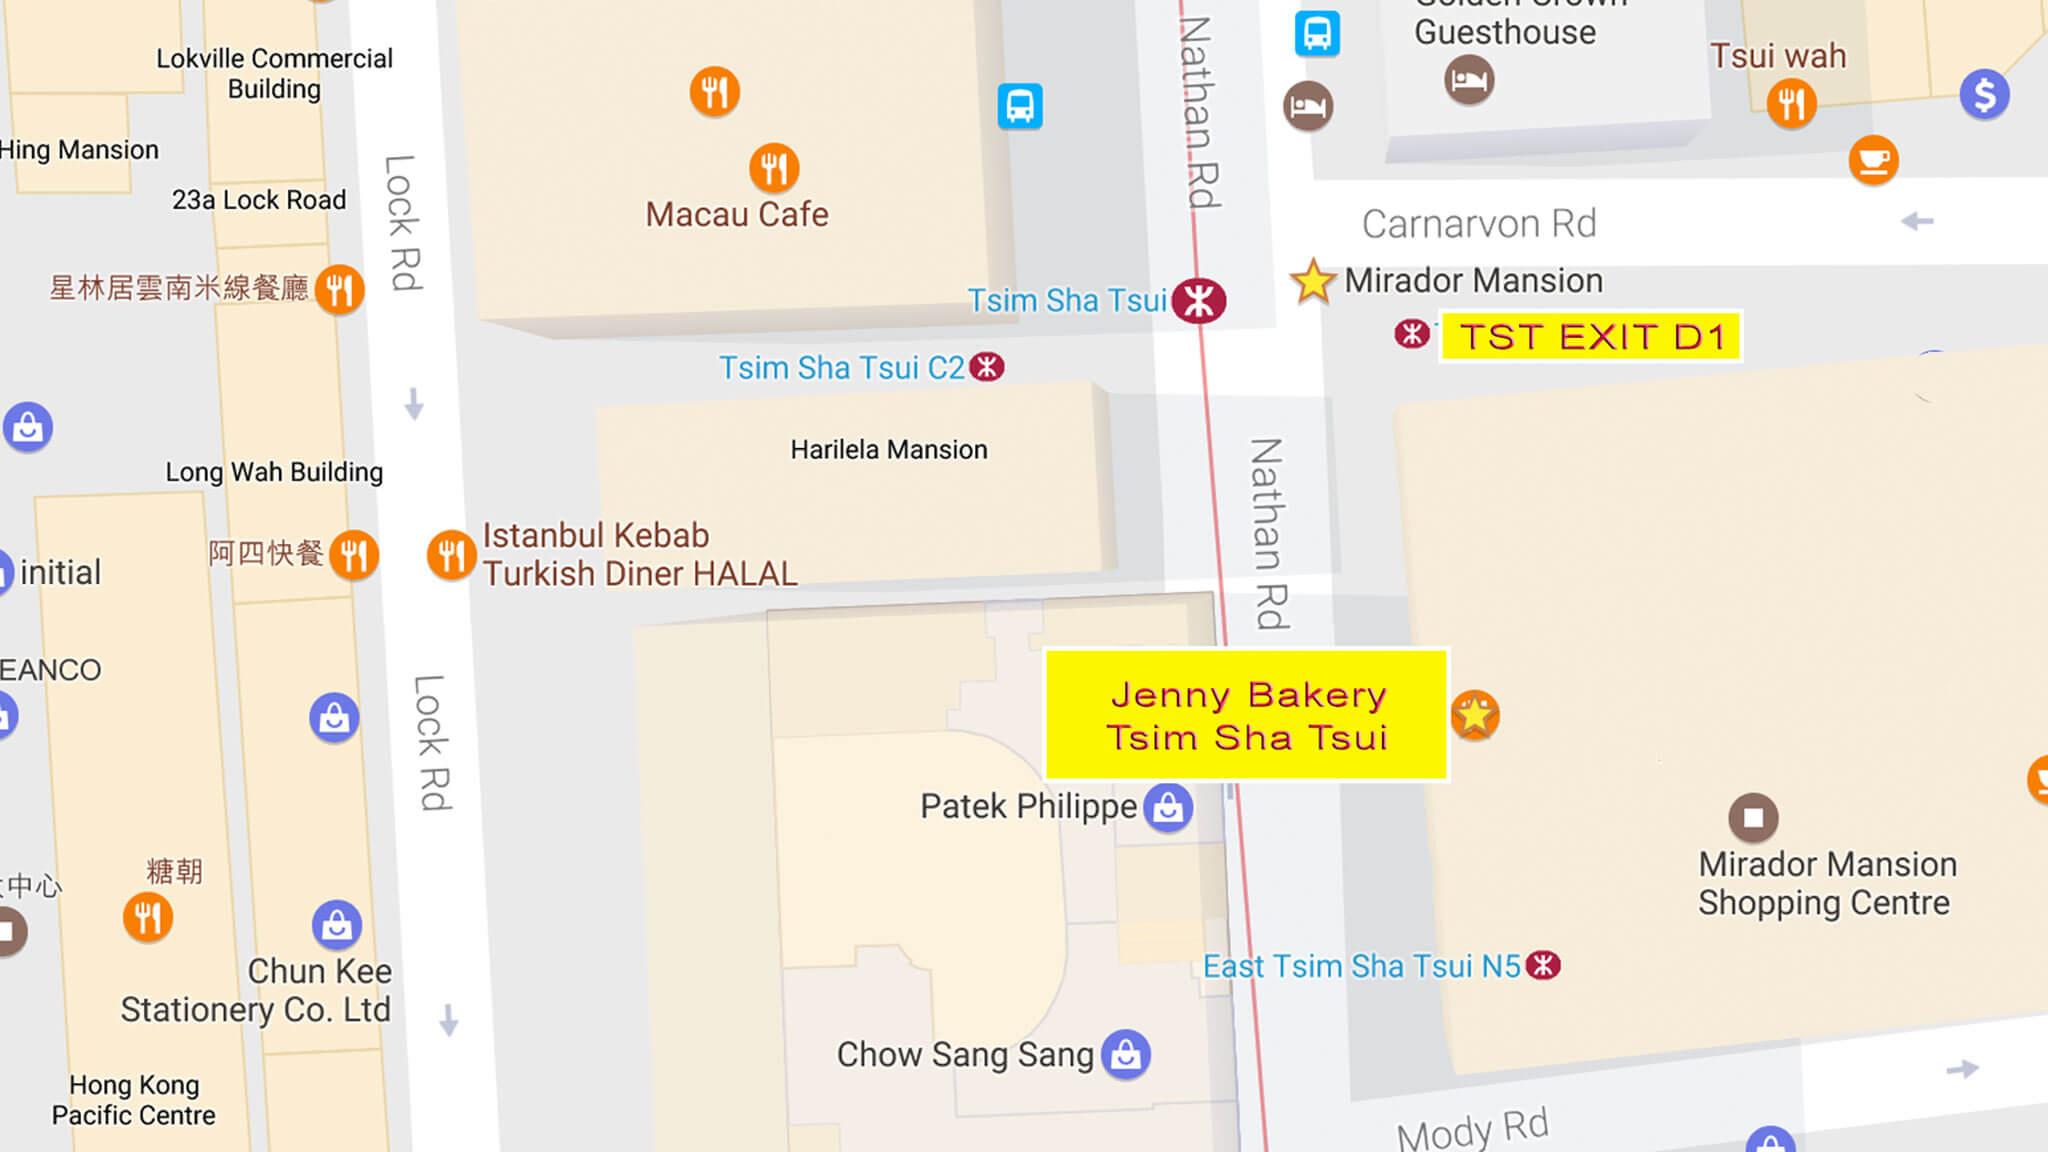 Hot to go to Jenny Bakery TSIM SHA TSUI (九龍尖沙咀)